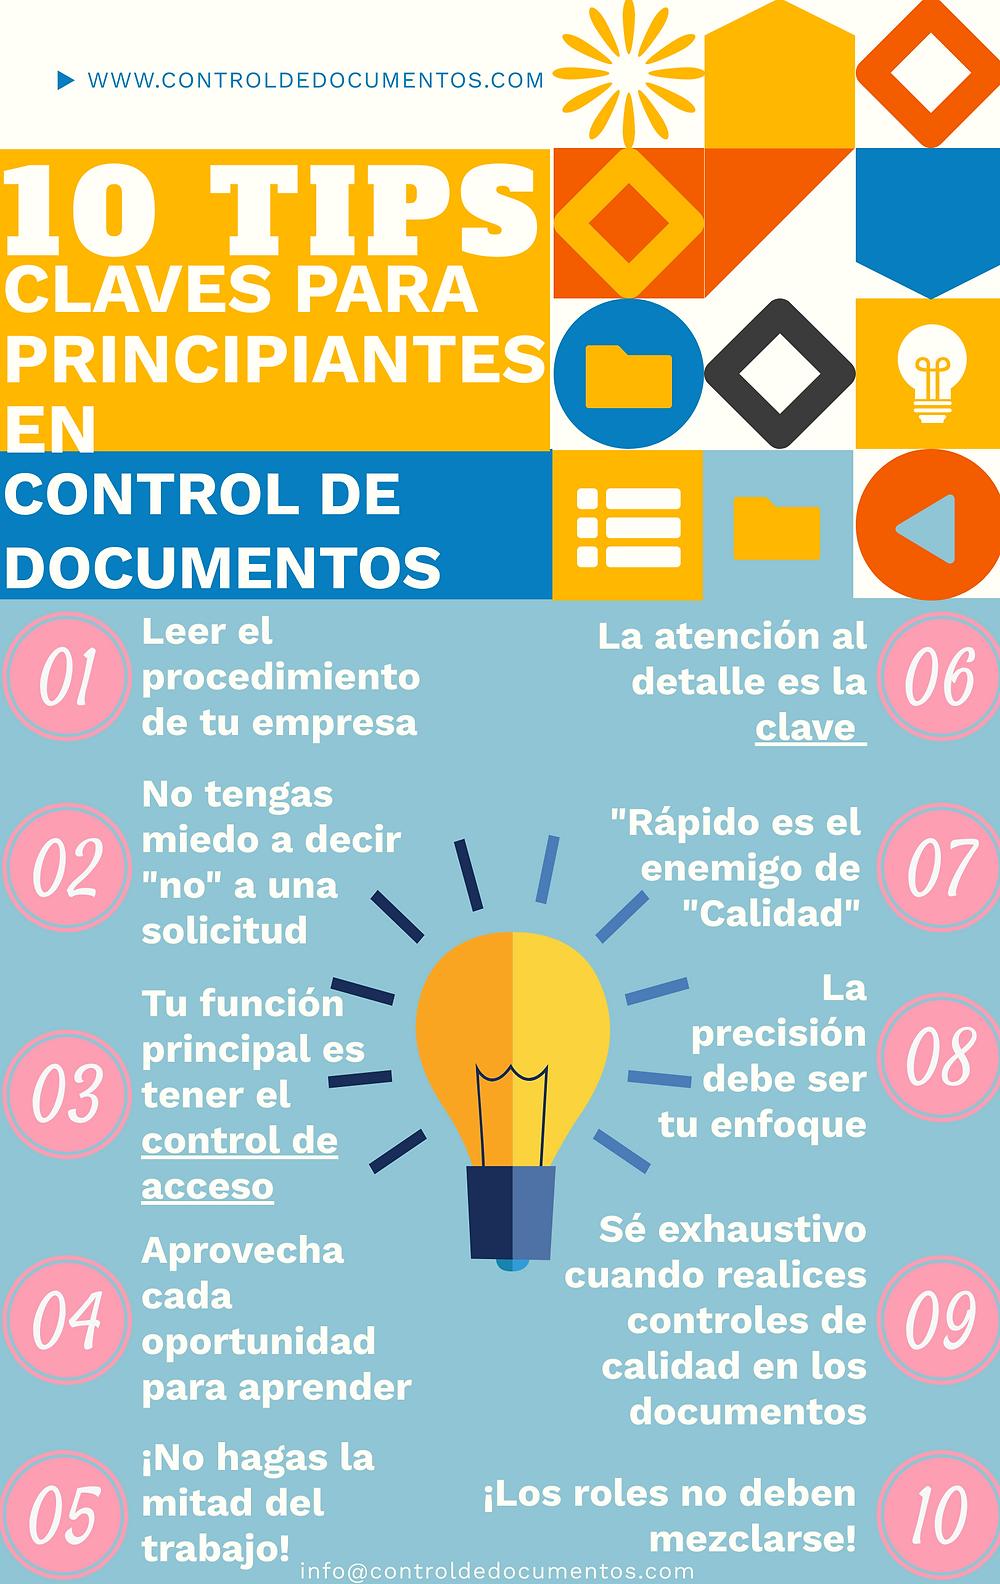 10 Tips claves para principiantes en control de documentos